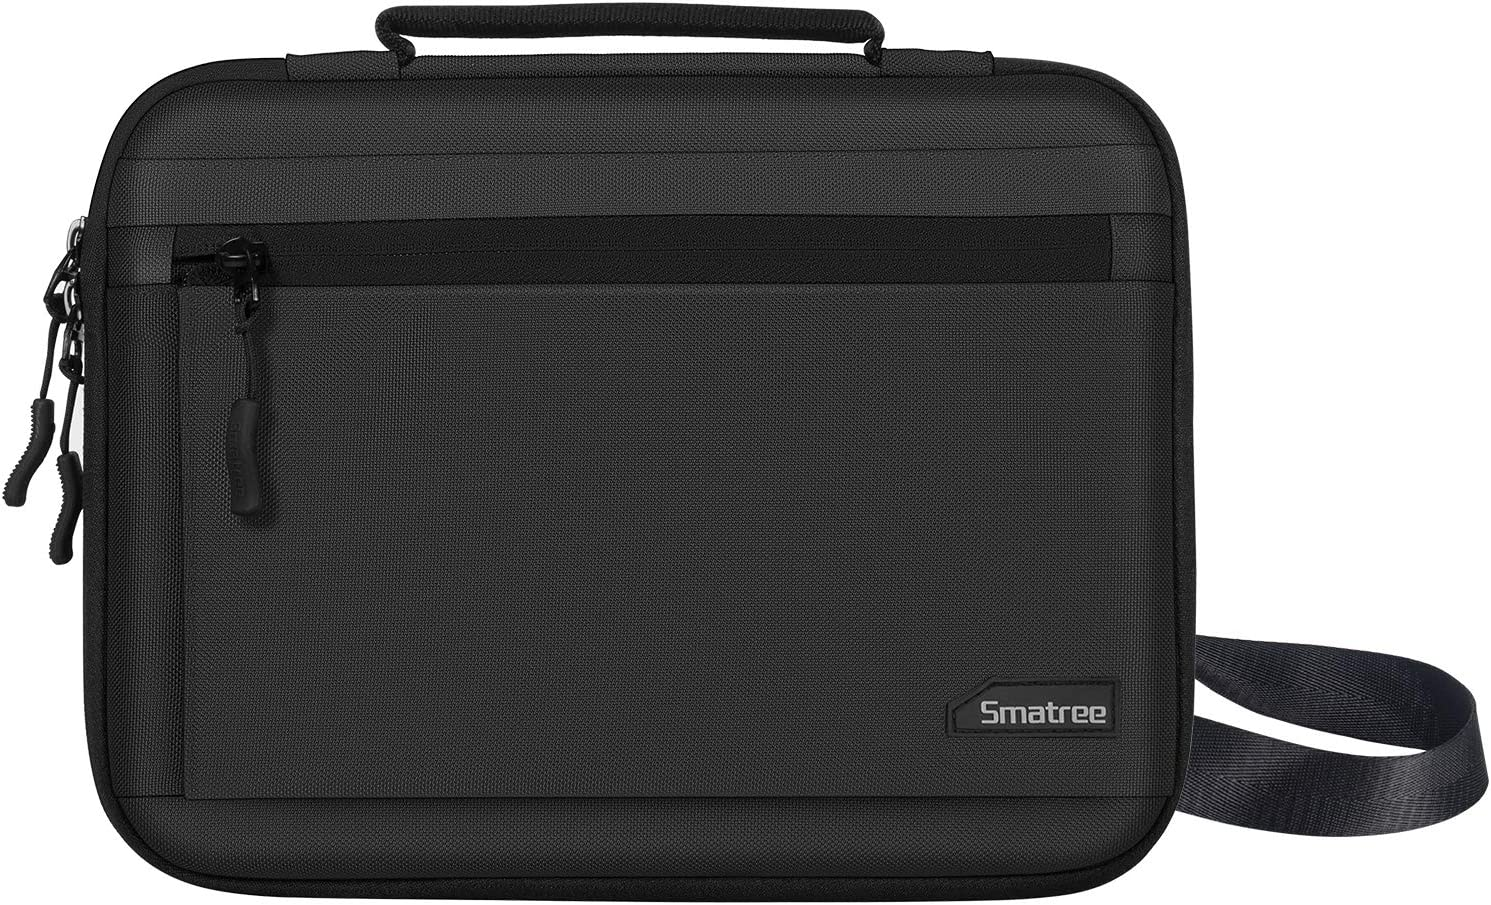 "Smatree 11.5inch Tablet Sleeve Case, Hardshell Tablet Protective Sleeve for 11"" iPad Pro / 10.9"" iPad Air 2020/10.2'' iPad/Samsung Galaxy Tab S4 / 10.1"" Lenovo Ideapad D330 / 7.9"" iPad Mini"